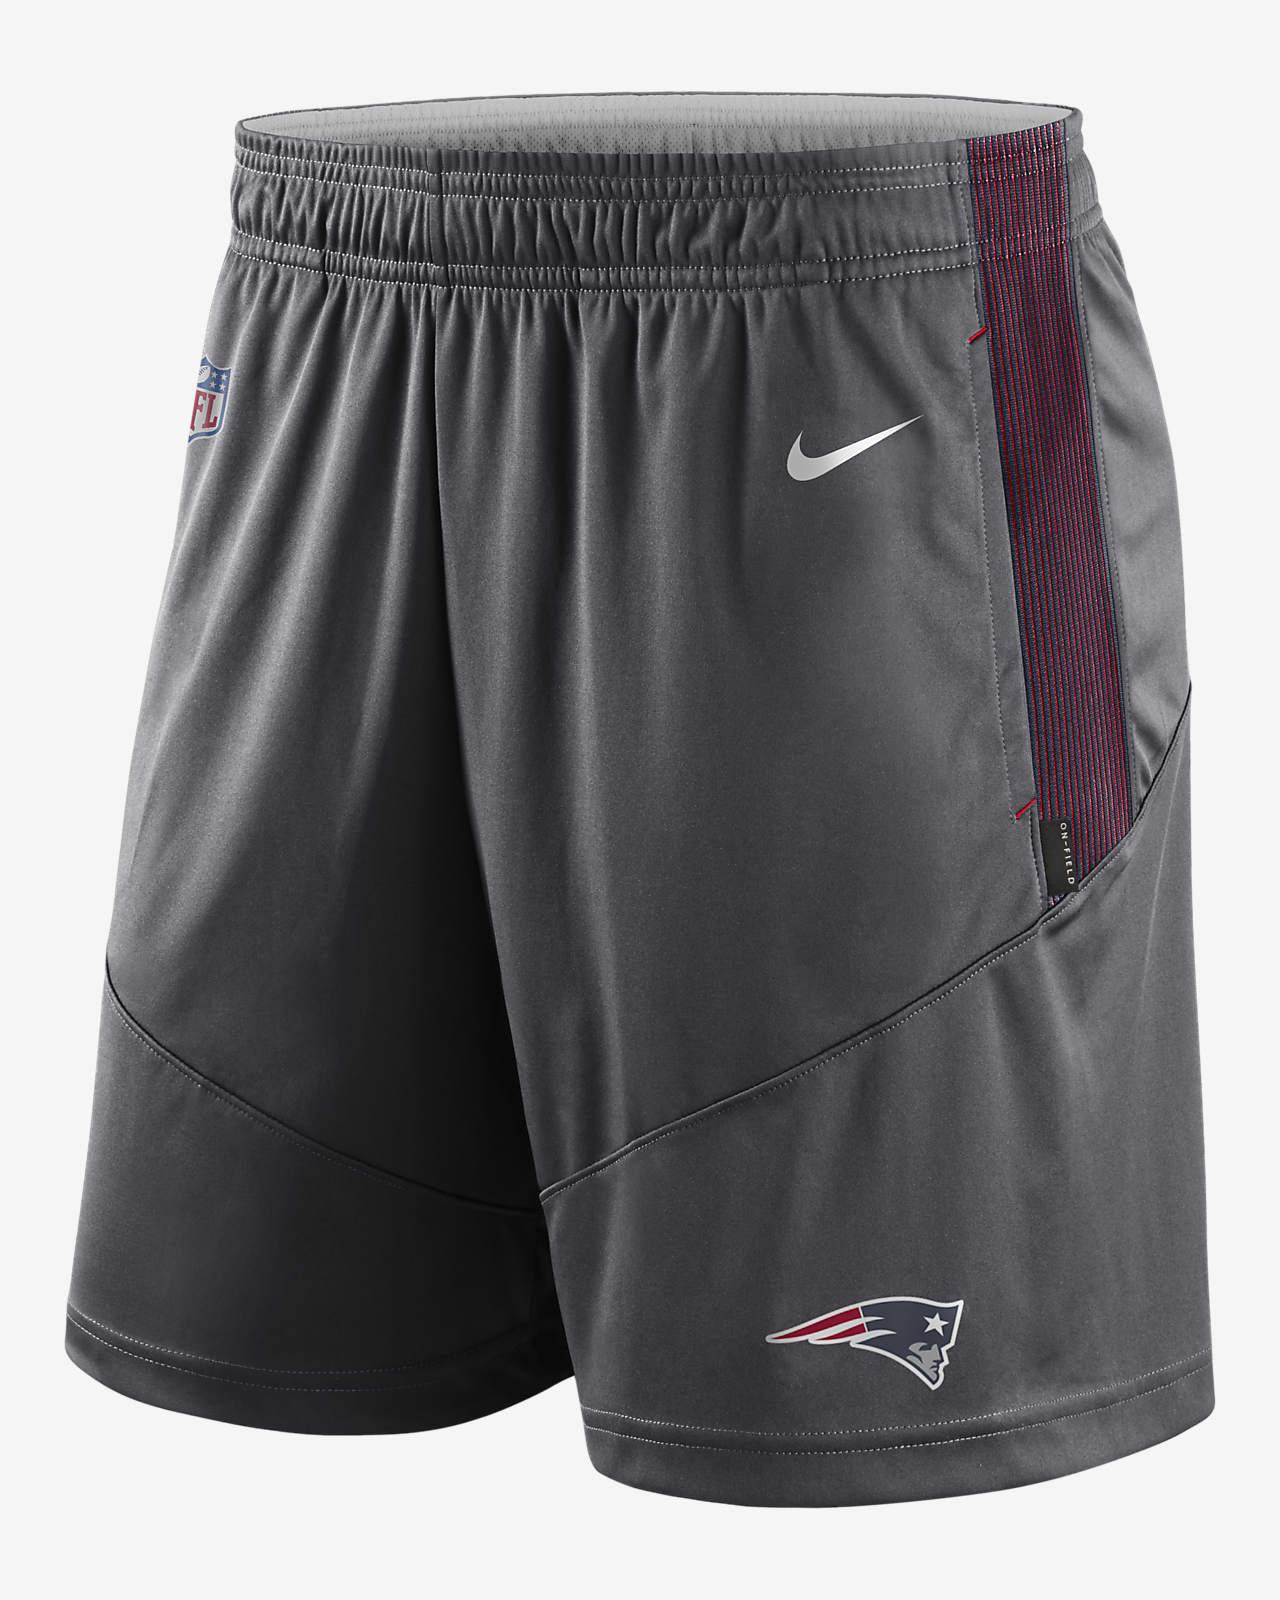 Nike Dri-FIT Sideline (NFL New England Patriots) Men's Shorts